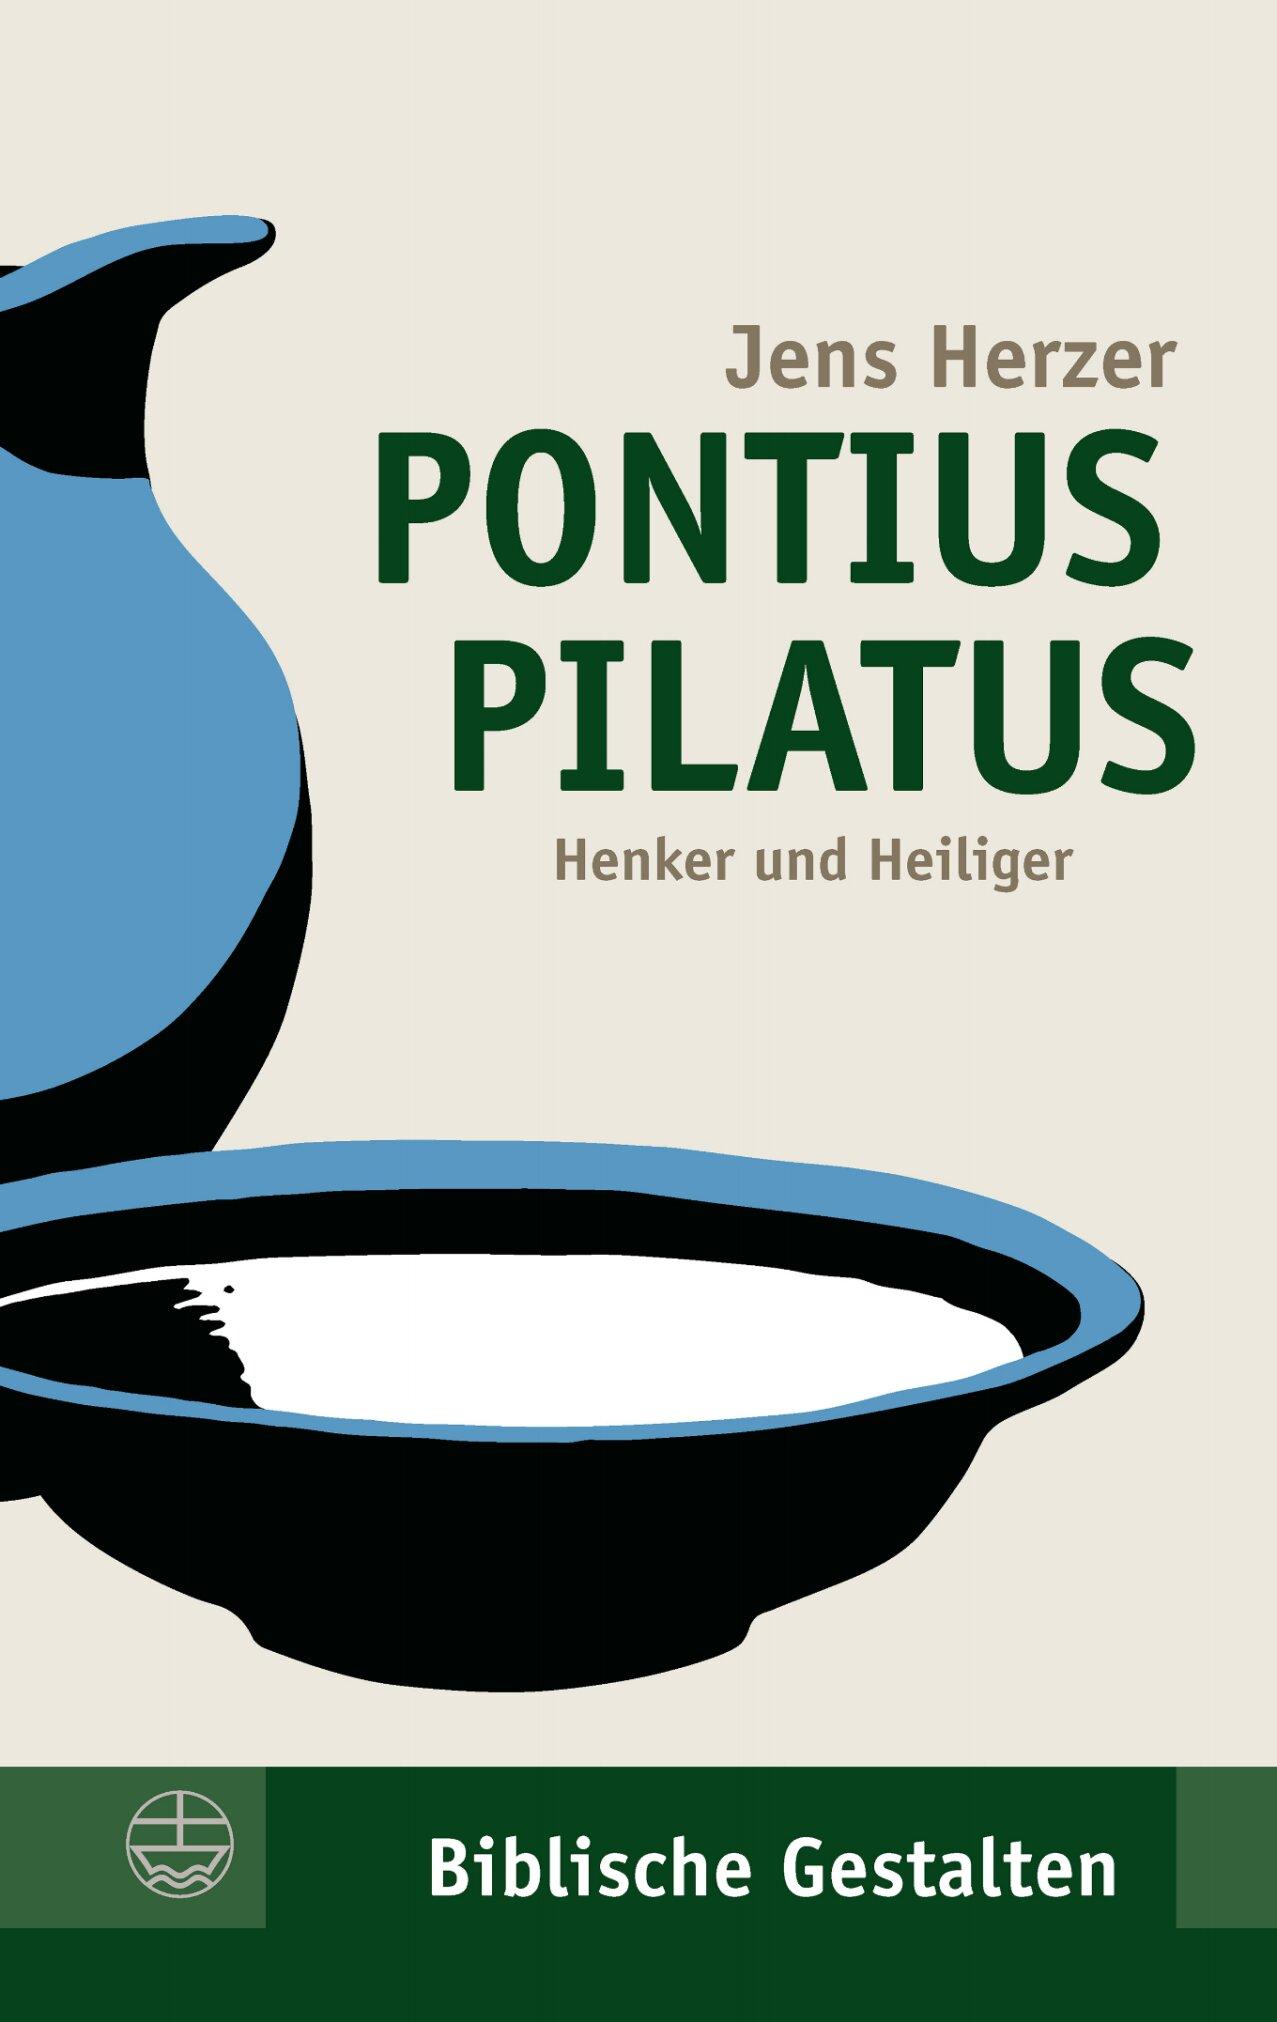 Pontius Pilatus: Henker und Heiliger (Biblische Gestalten)